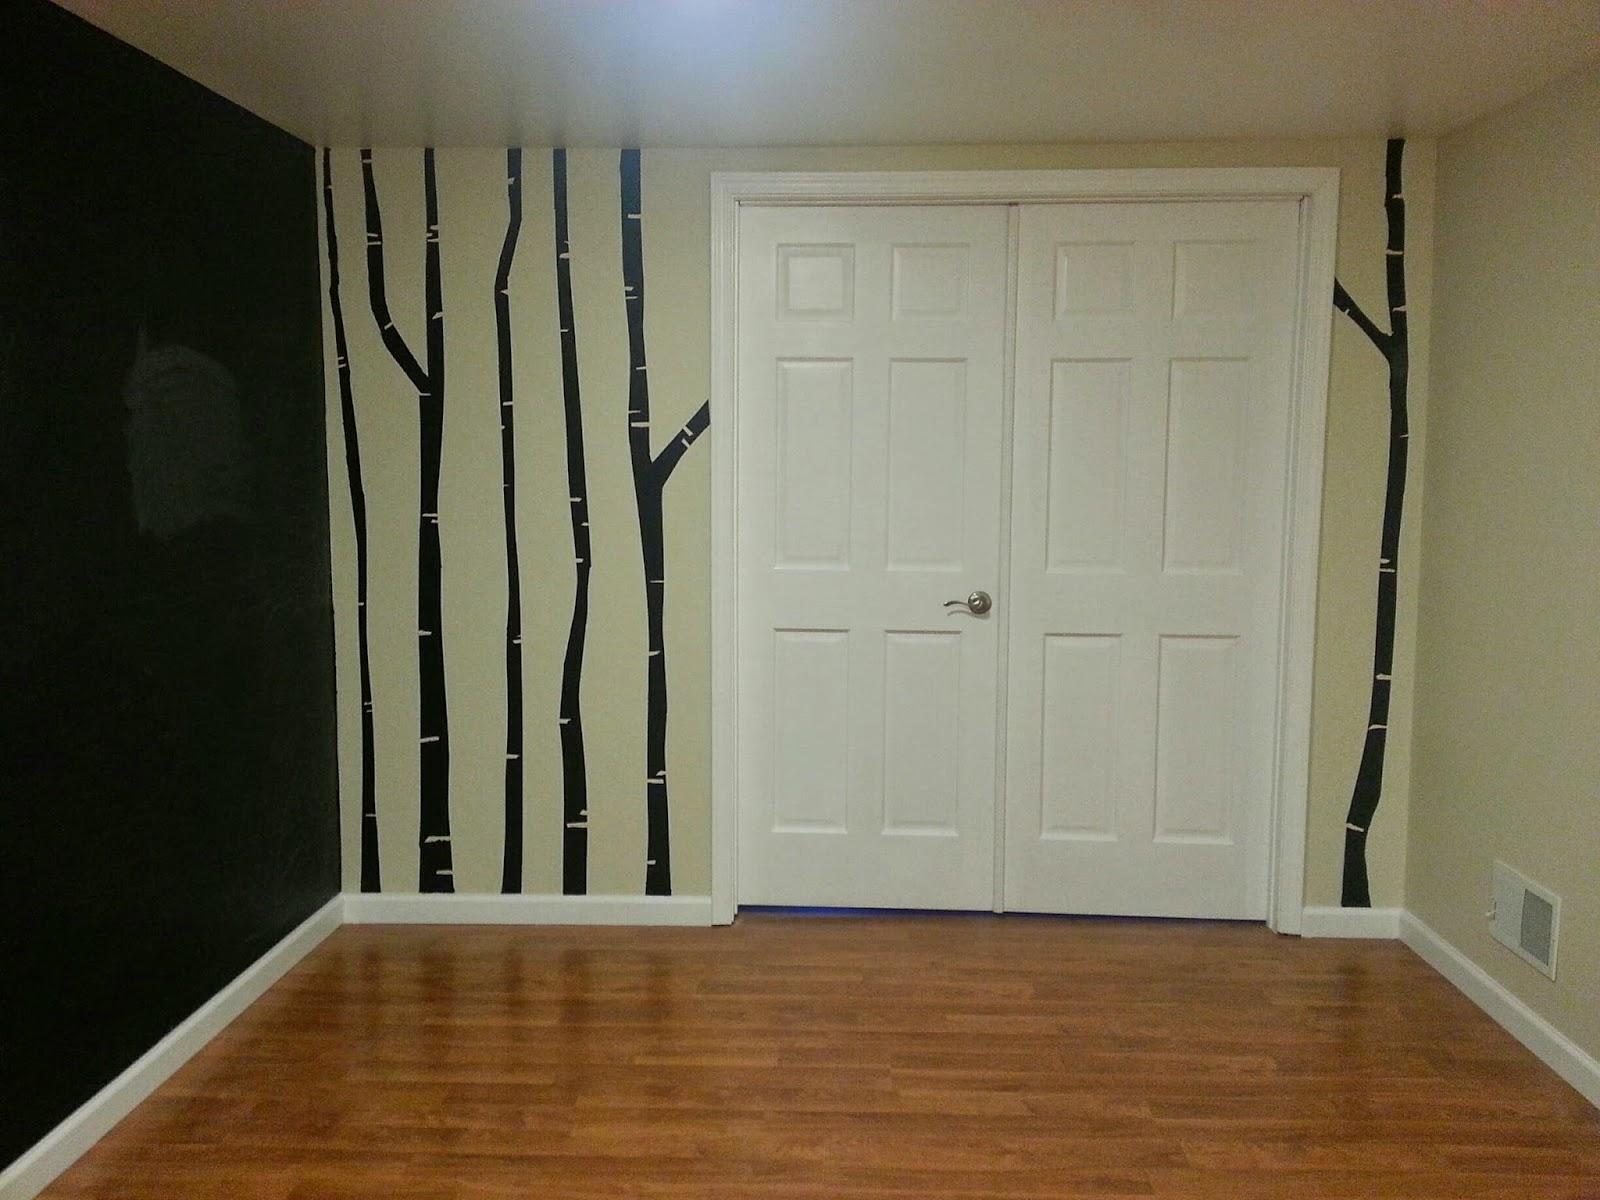 wading through soup chalkboard paint birch tree mural featuring chalkboard paint birch tree mural featuring lullaby paints zero voc chalkboard paint